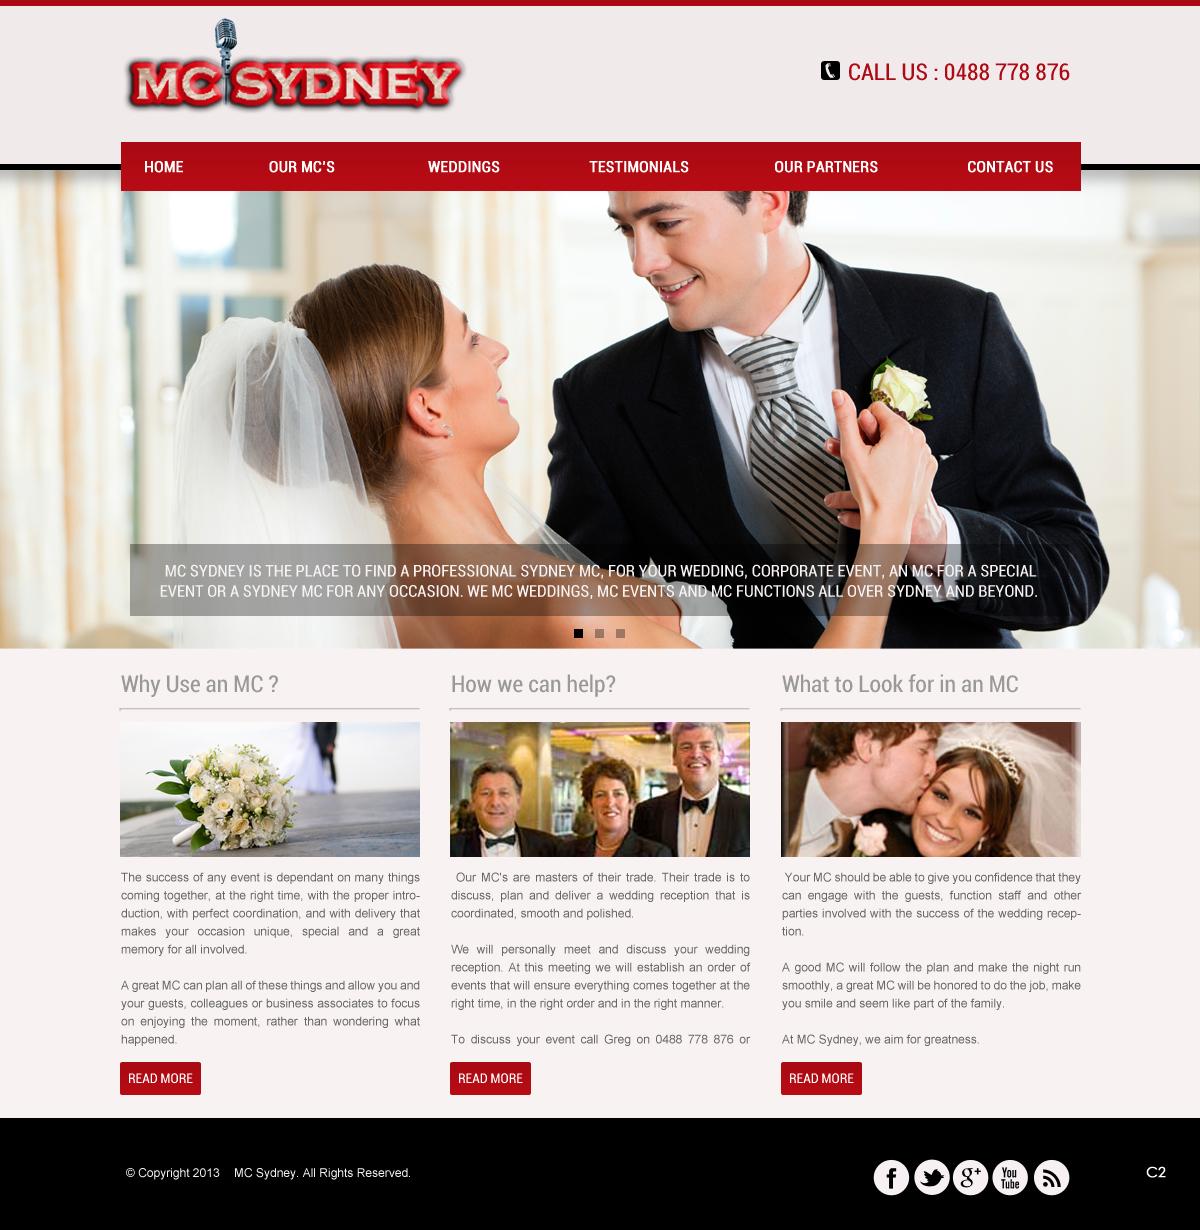 Elegant Playful Wedding Web Design For Mc Sydney By Pb Design 1721661